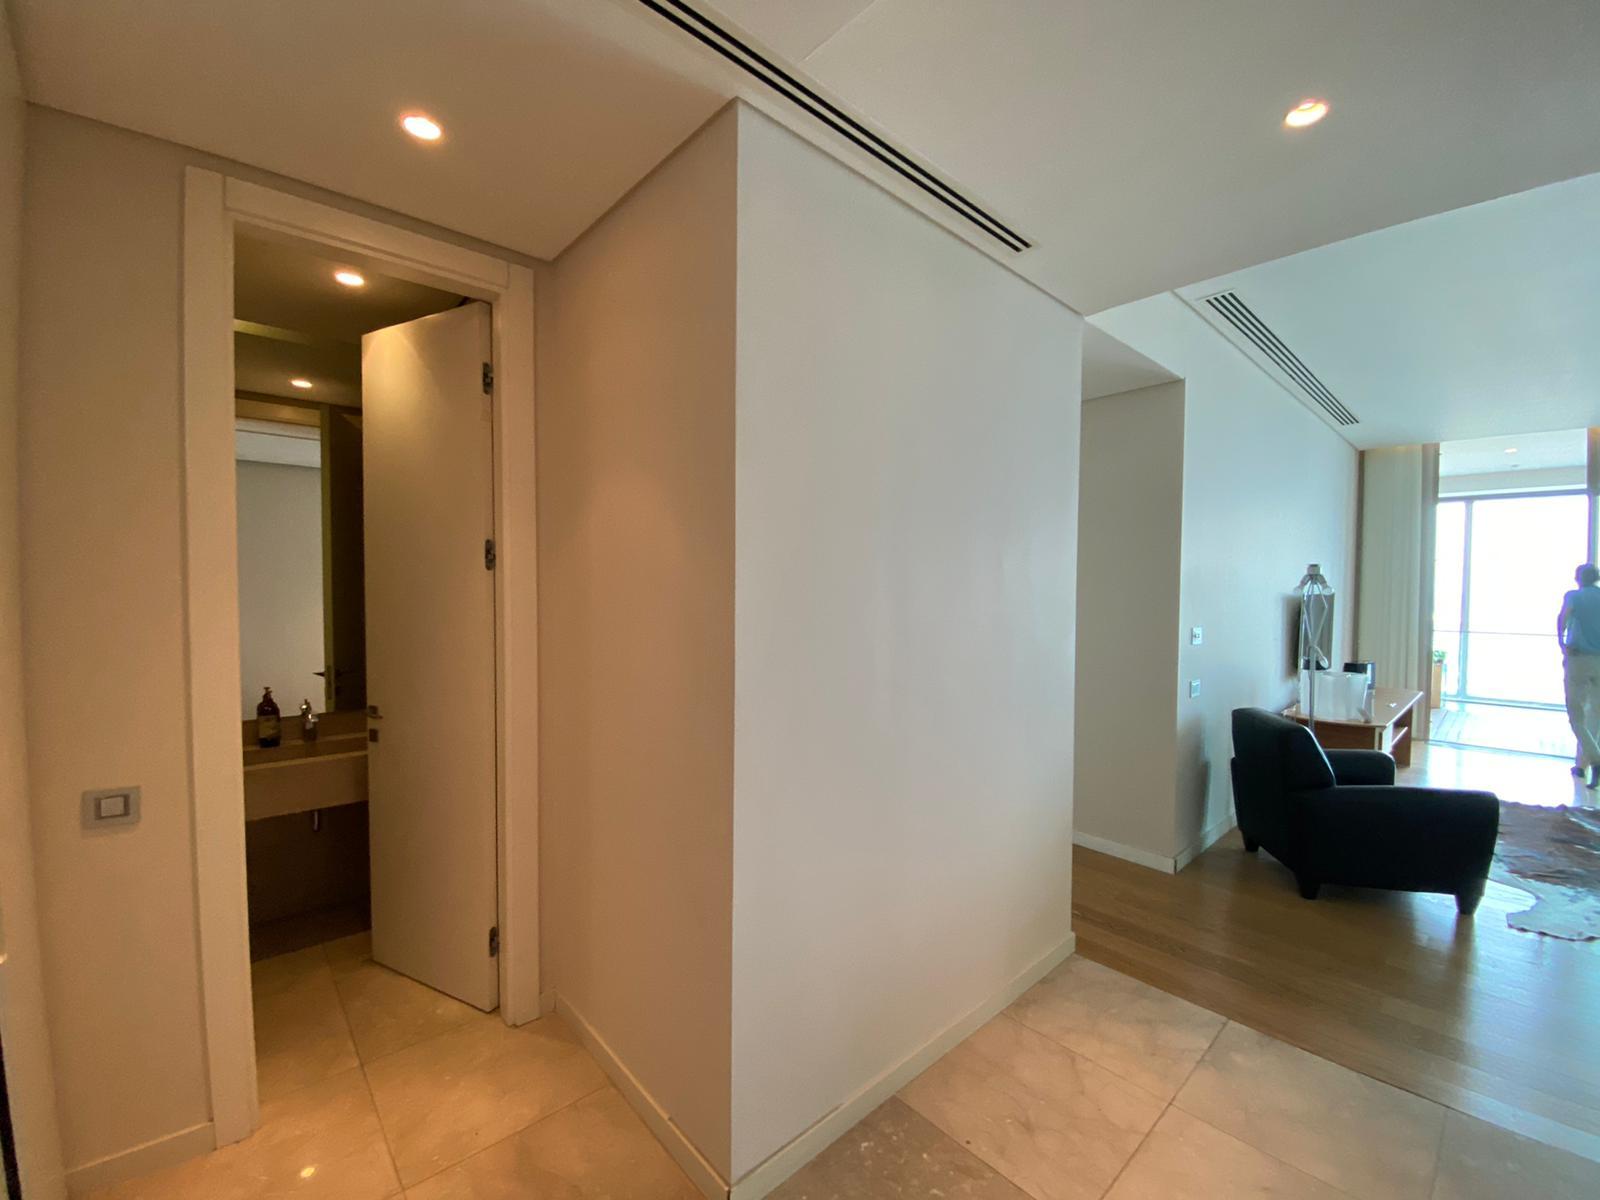 penthouse-istanbul-sapphire-tower-42th-floor-013.jpg